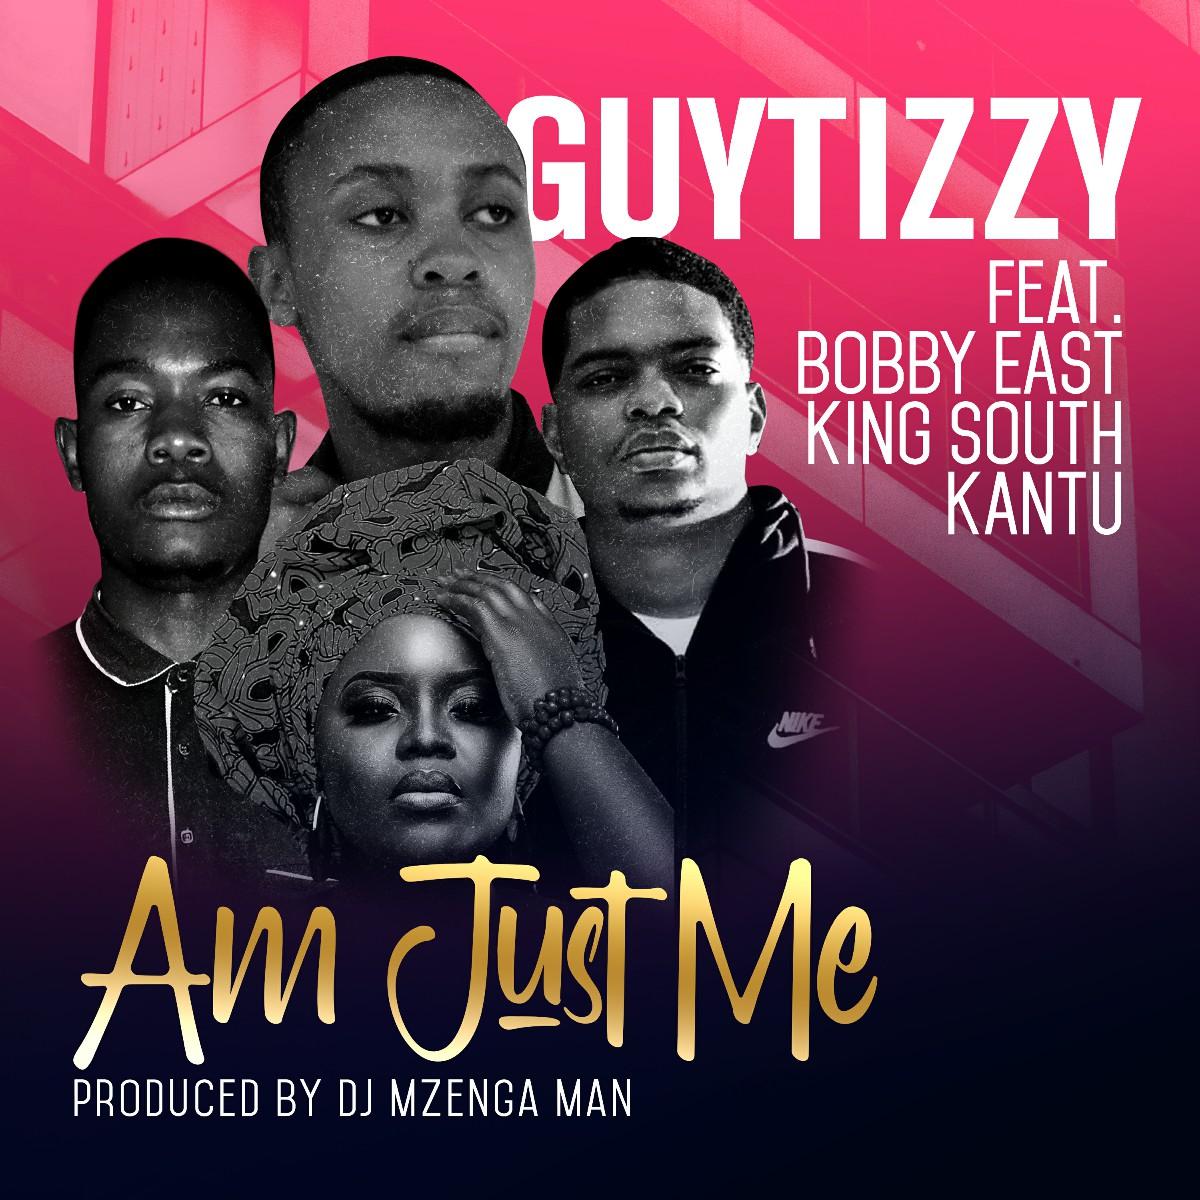 Guytizzy ft. Bobby East, King South & Kantu - Am Just Me